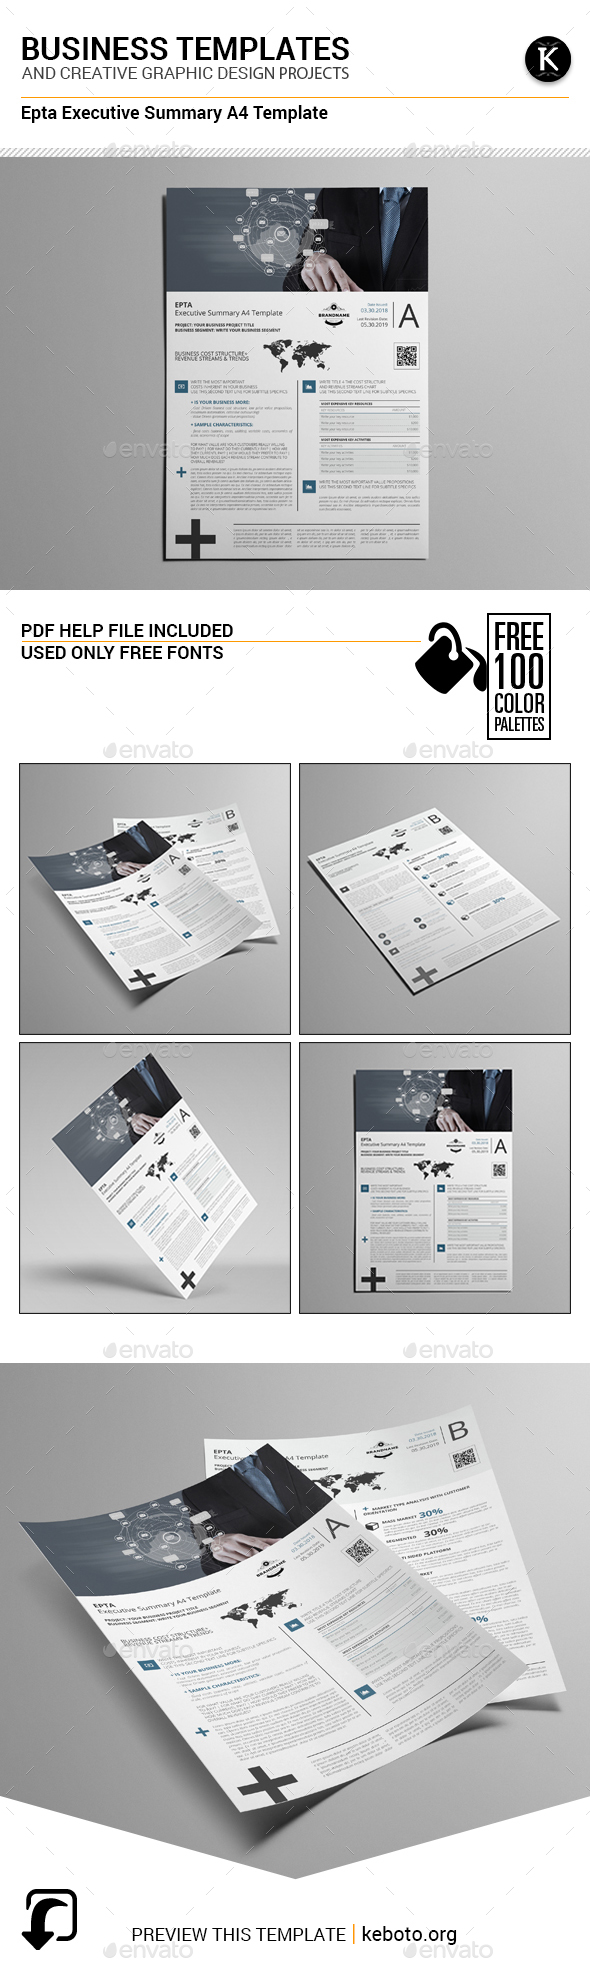 Epta Executive Summary A4 Template - Miscellaneous Print Templates